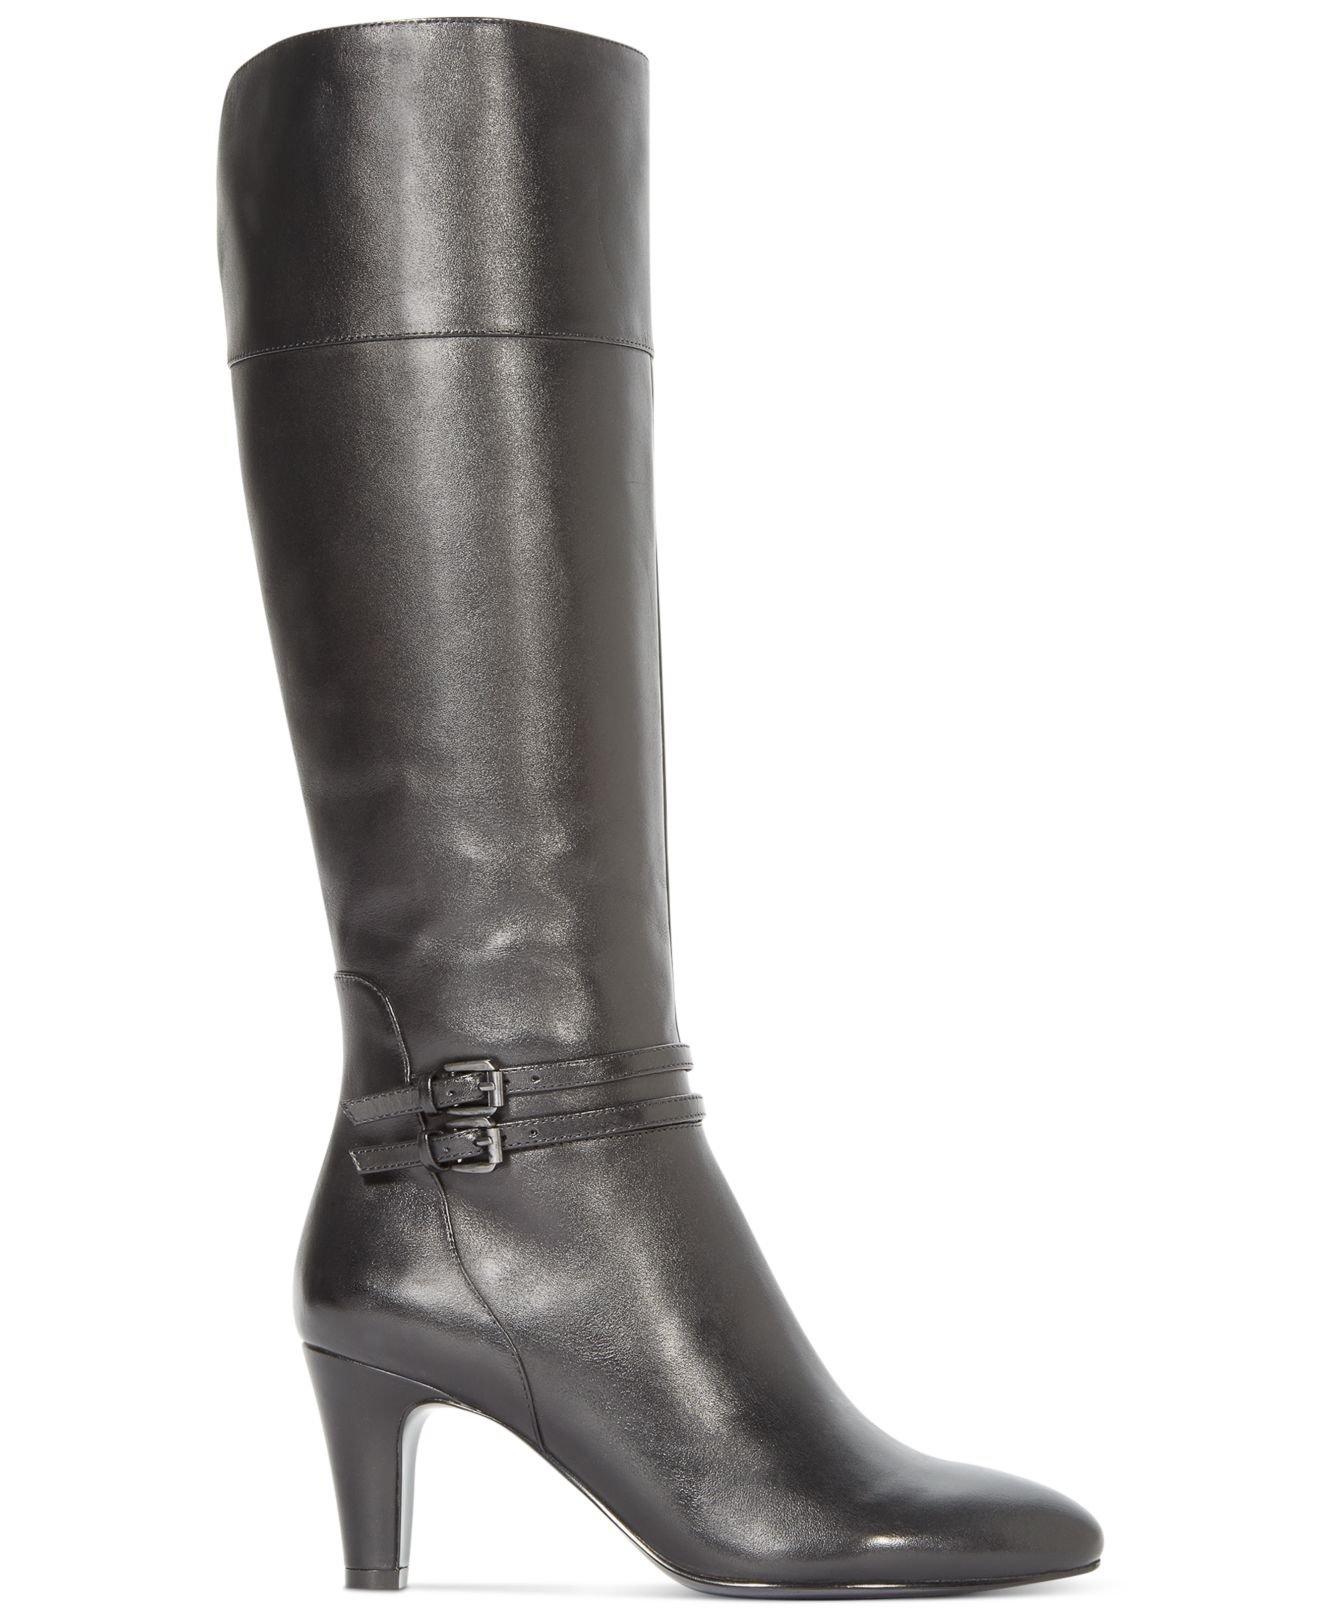 968cc928bc4 Lyst - Bandolino Wiser Wide Calf Buckle Dress Boots in Black